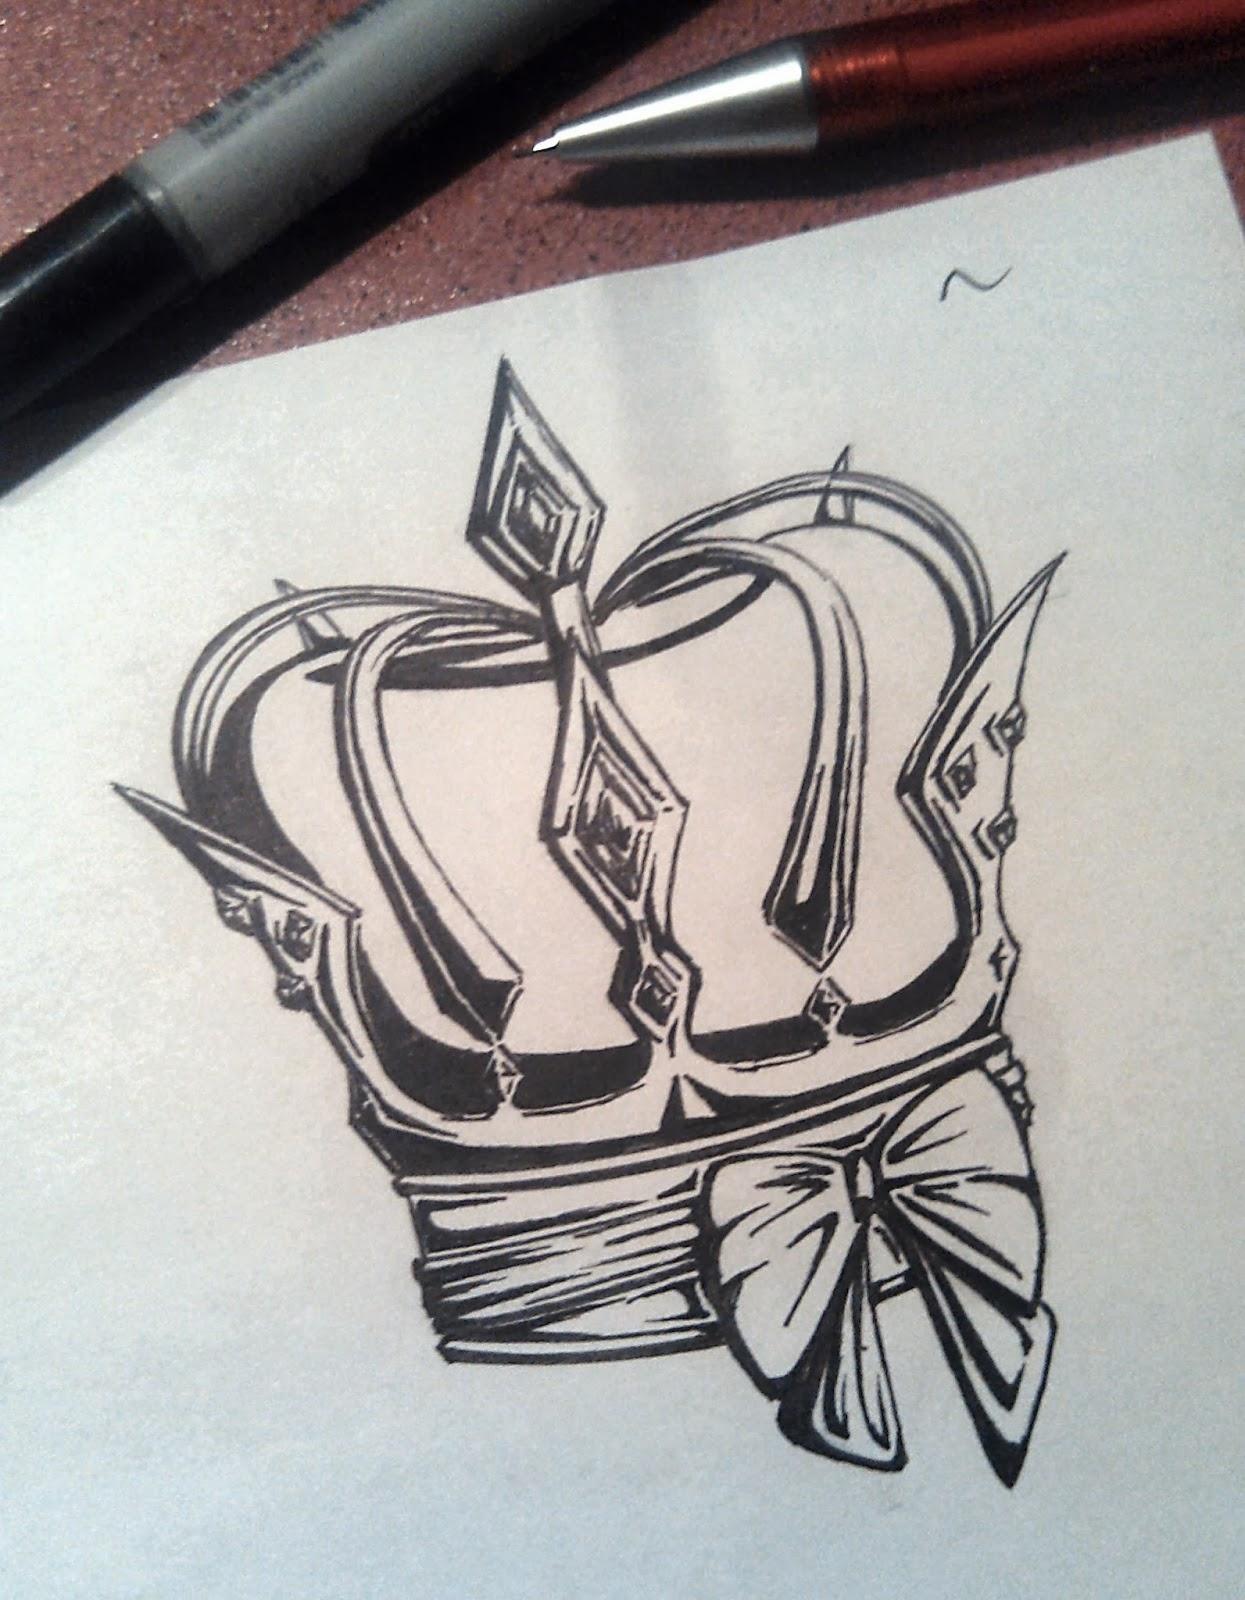 Scribble Tattoo Designs